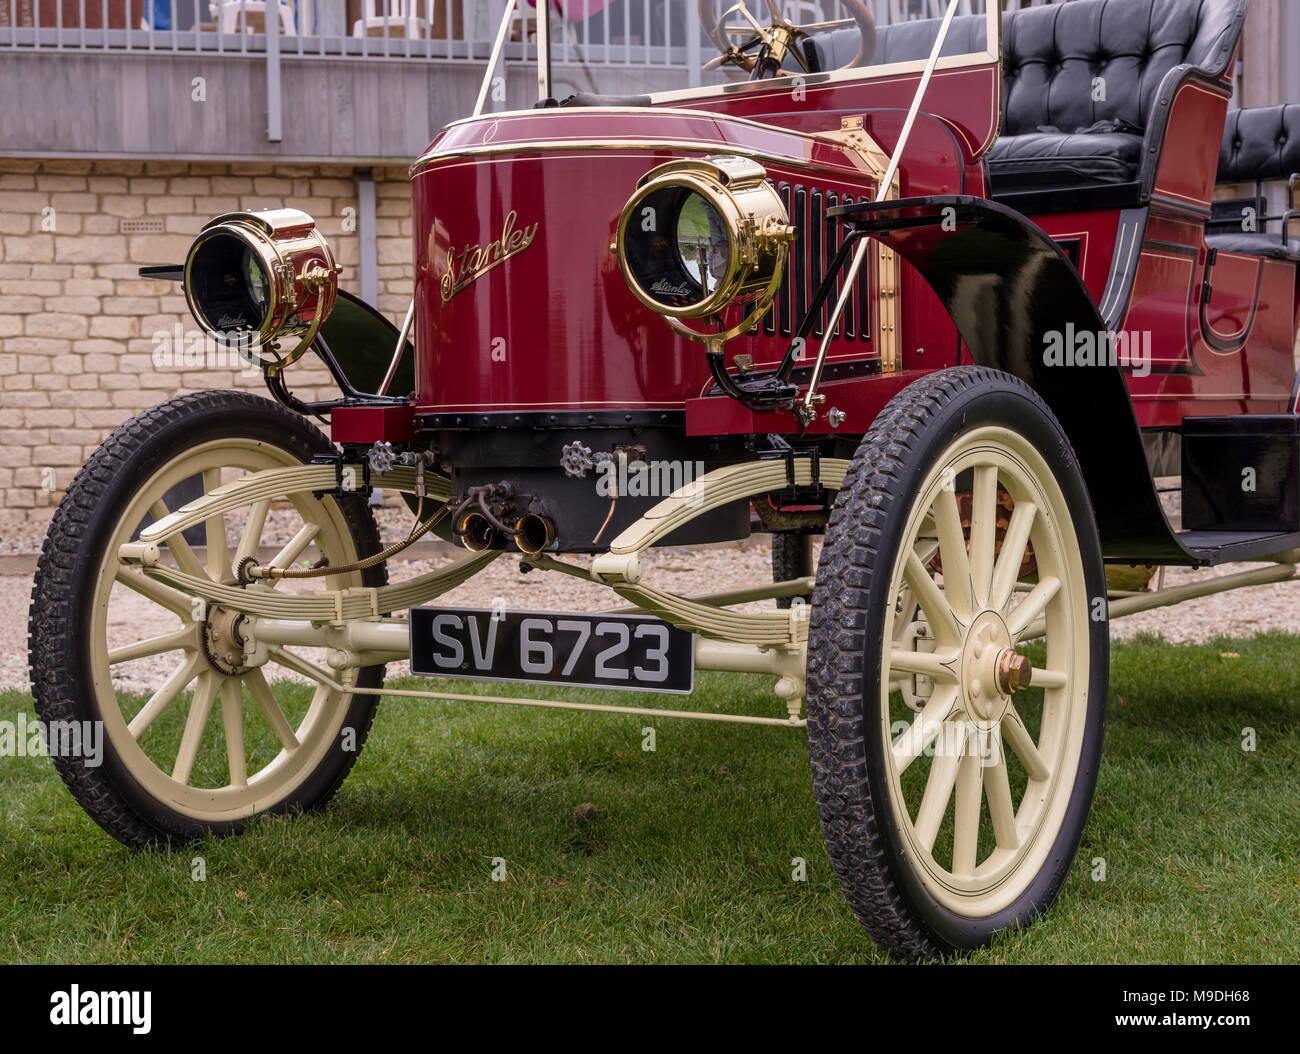 Stanley Steamer vintage motor car at Prescott Hill Climb. - Stock Image